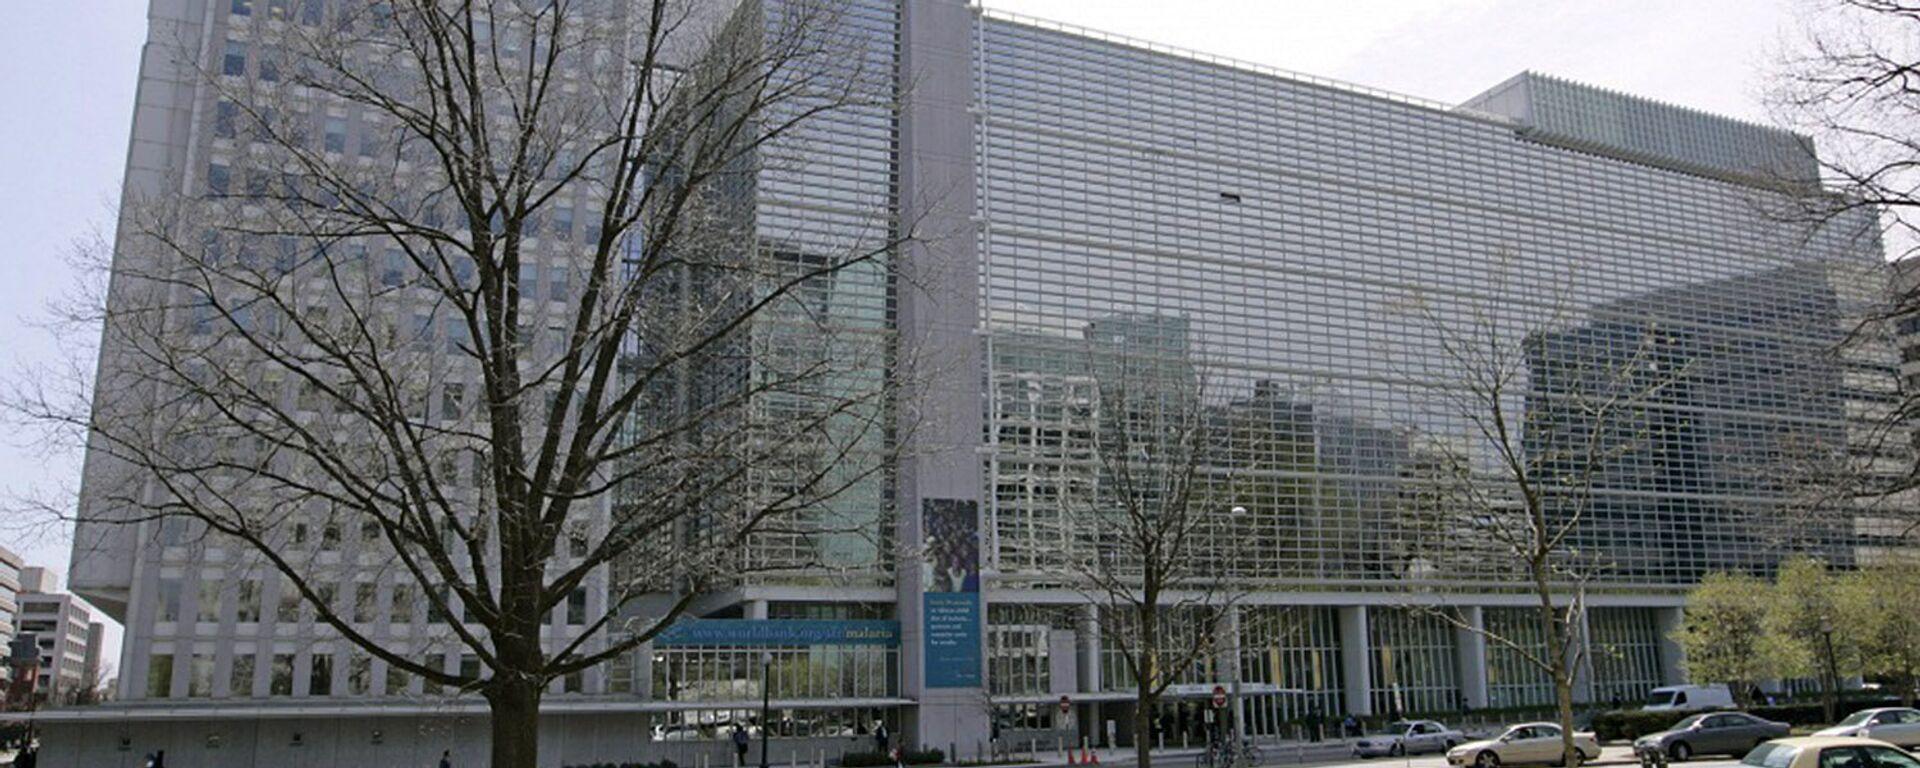 Штаб-квартира Всемирного банка в Вашингтоне - Sputnik Ўзбекистон, 1920, 09.06.2021